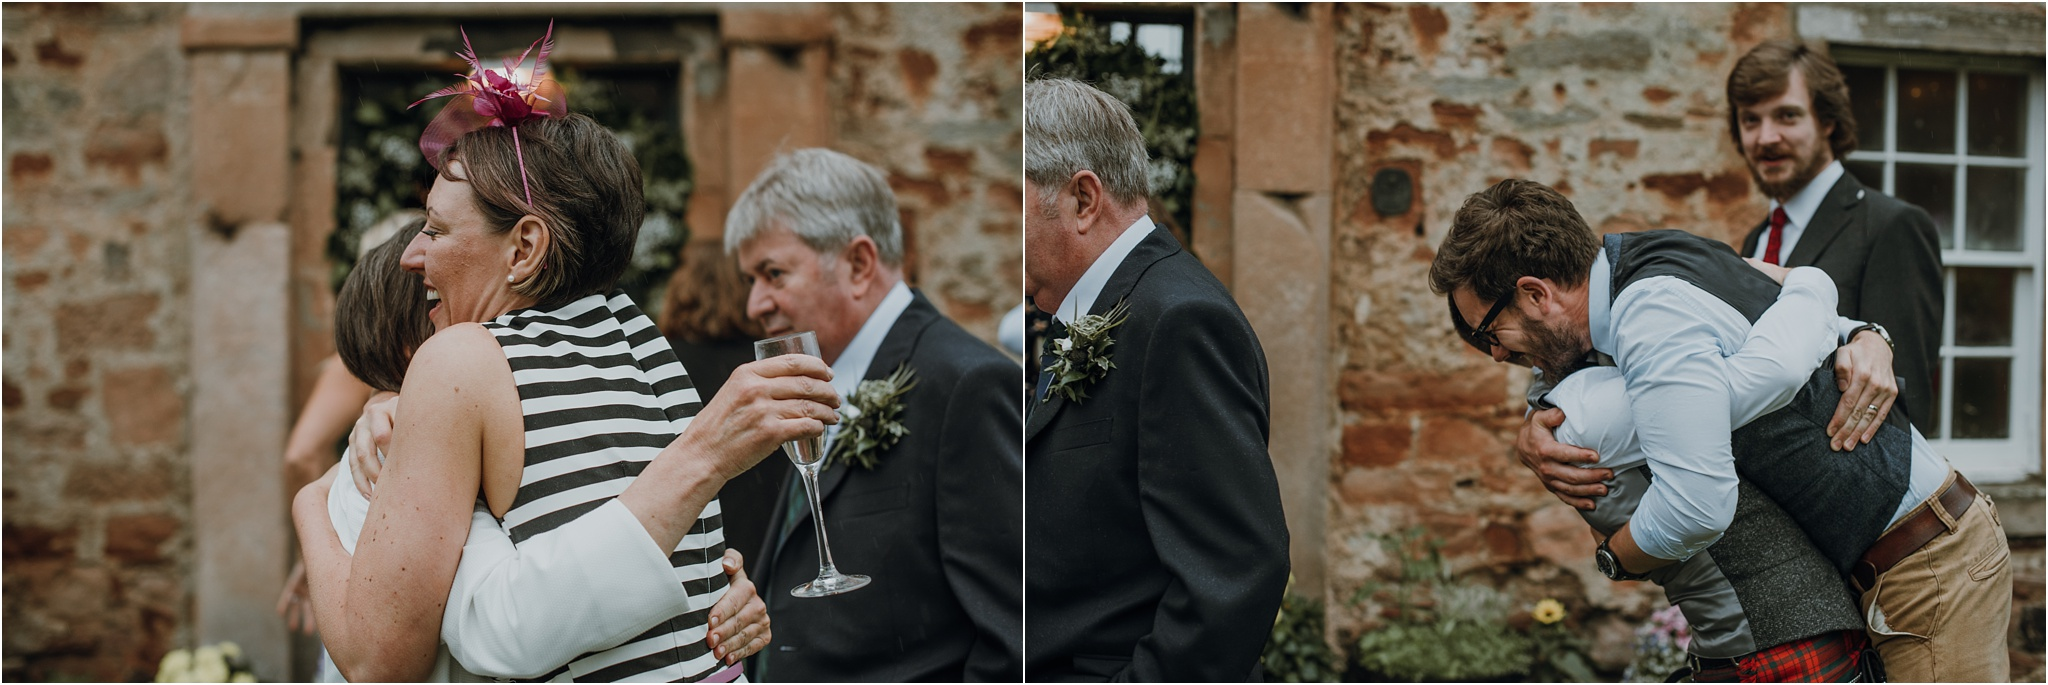 Tyninghame-Village-hall-wedding_0077.jpg